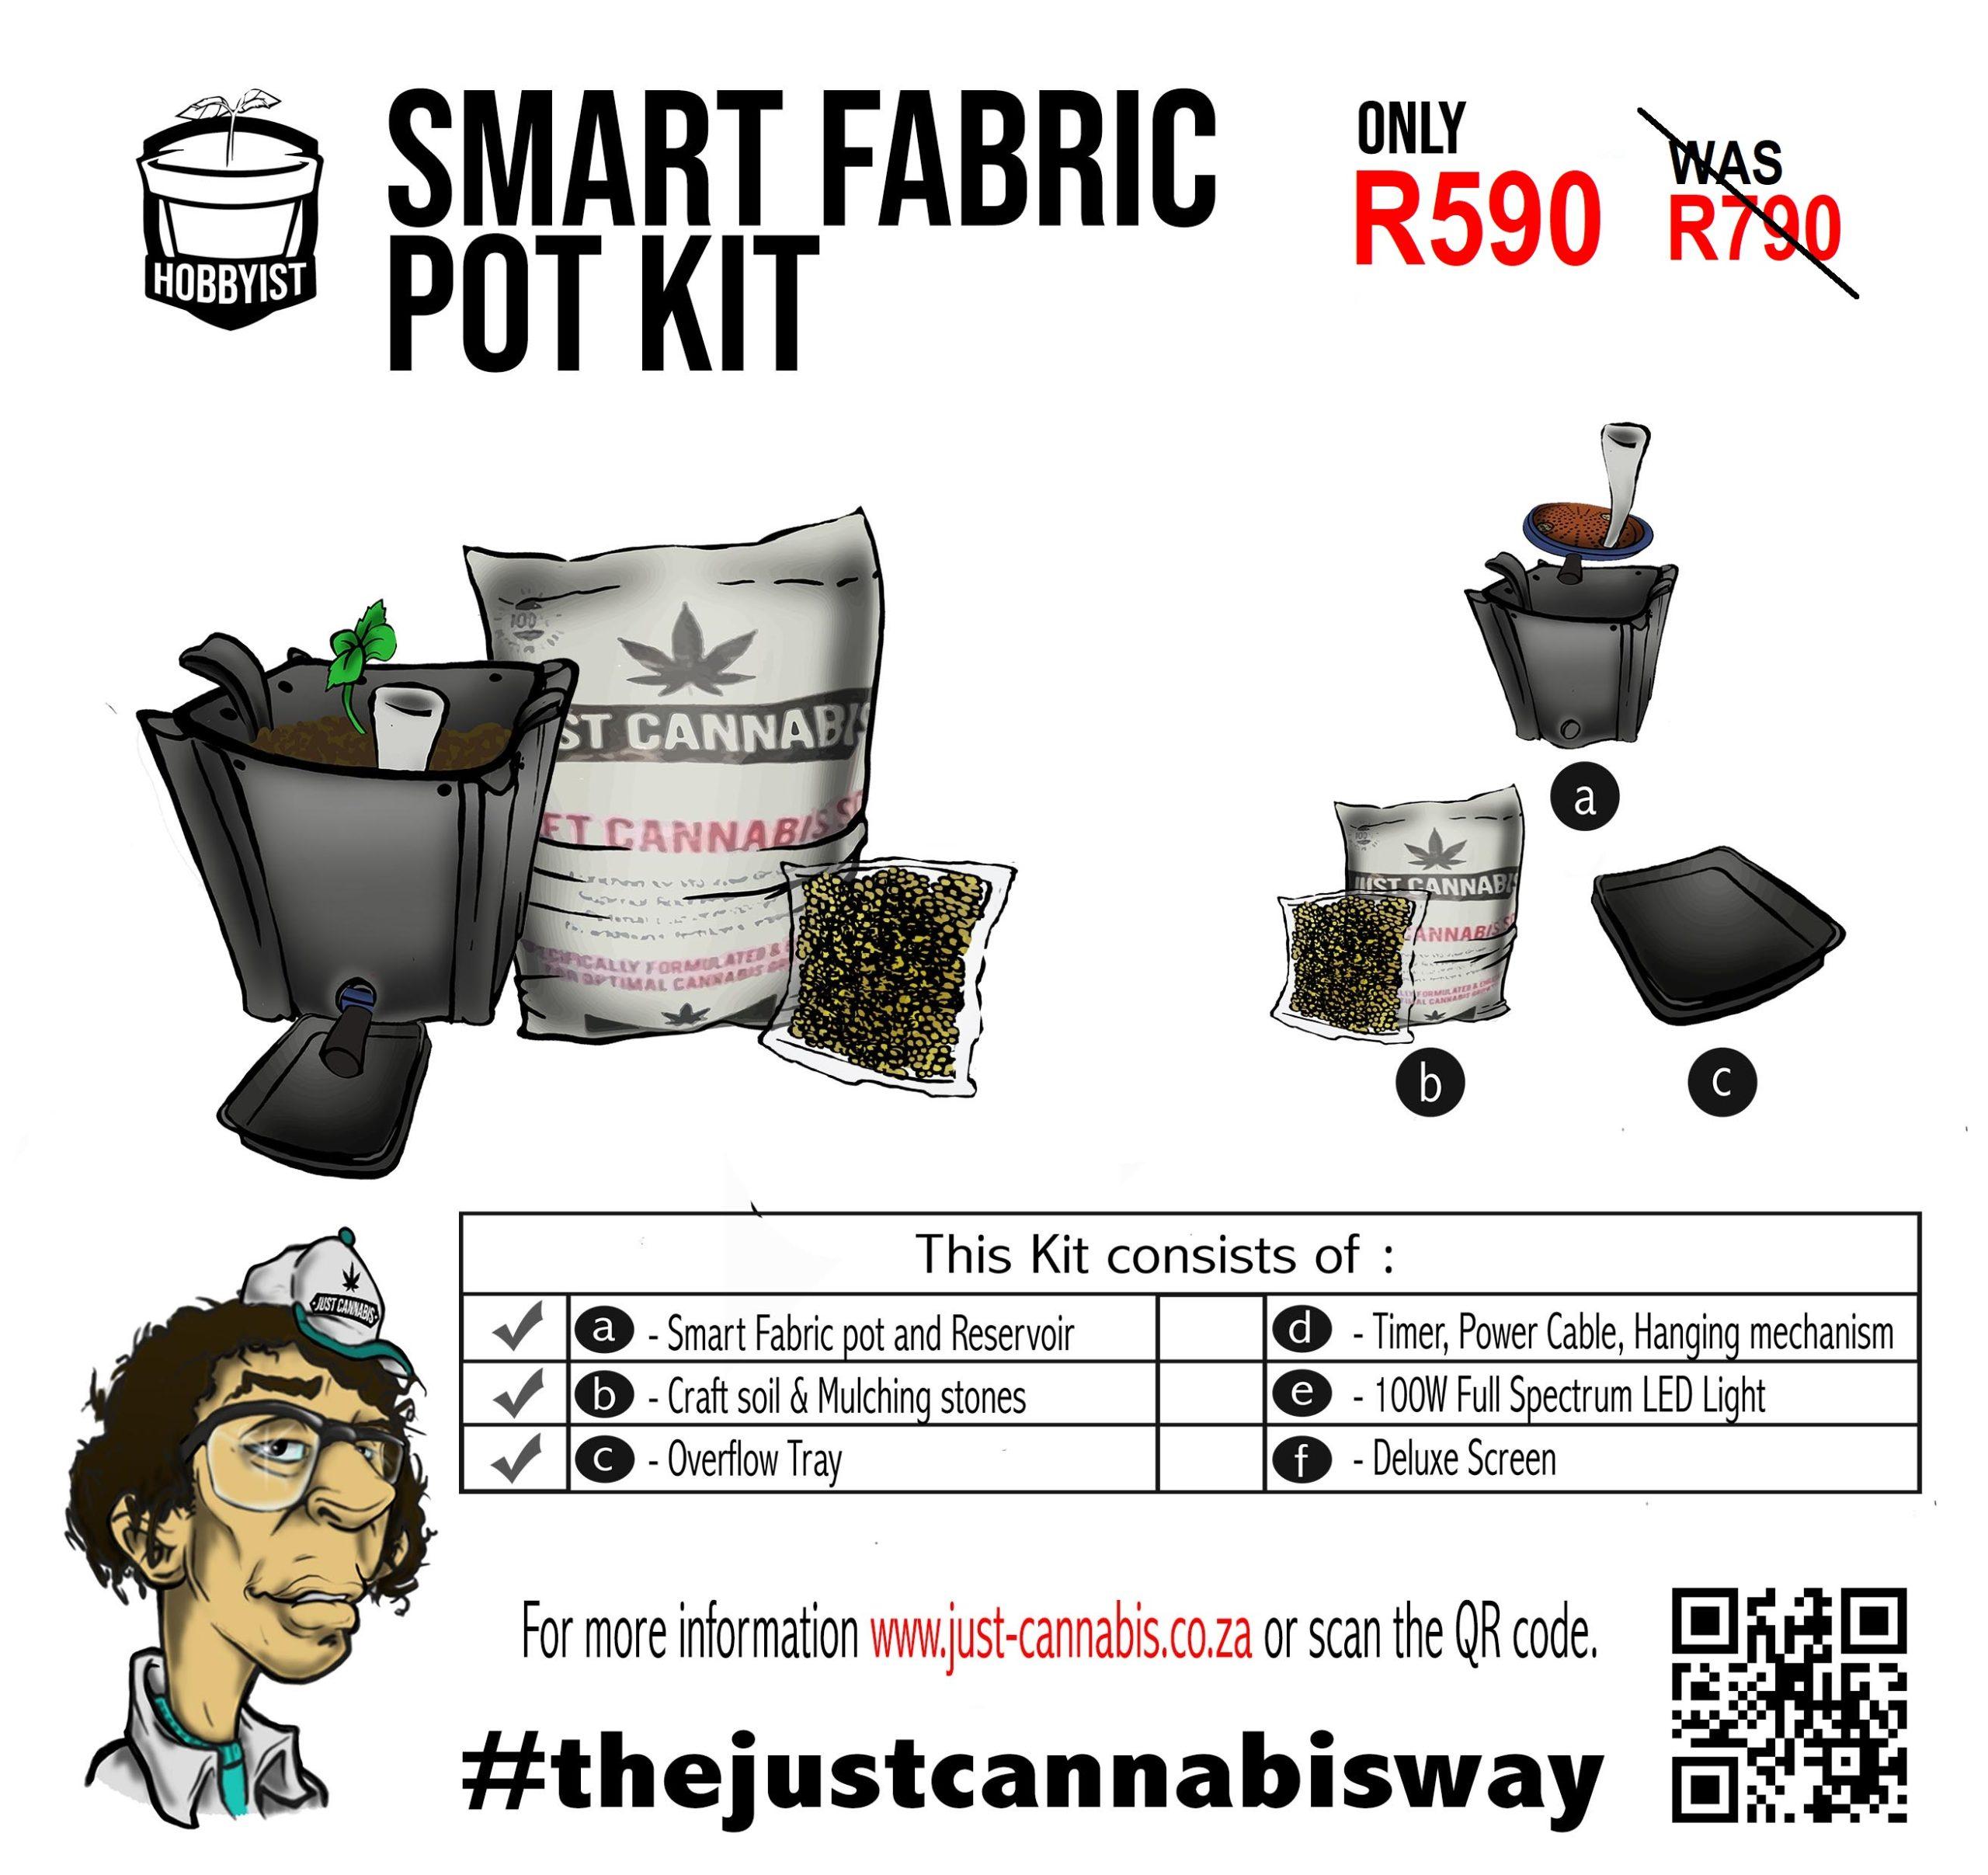 Hobbyist Smart Fabric Pot Kit